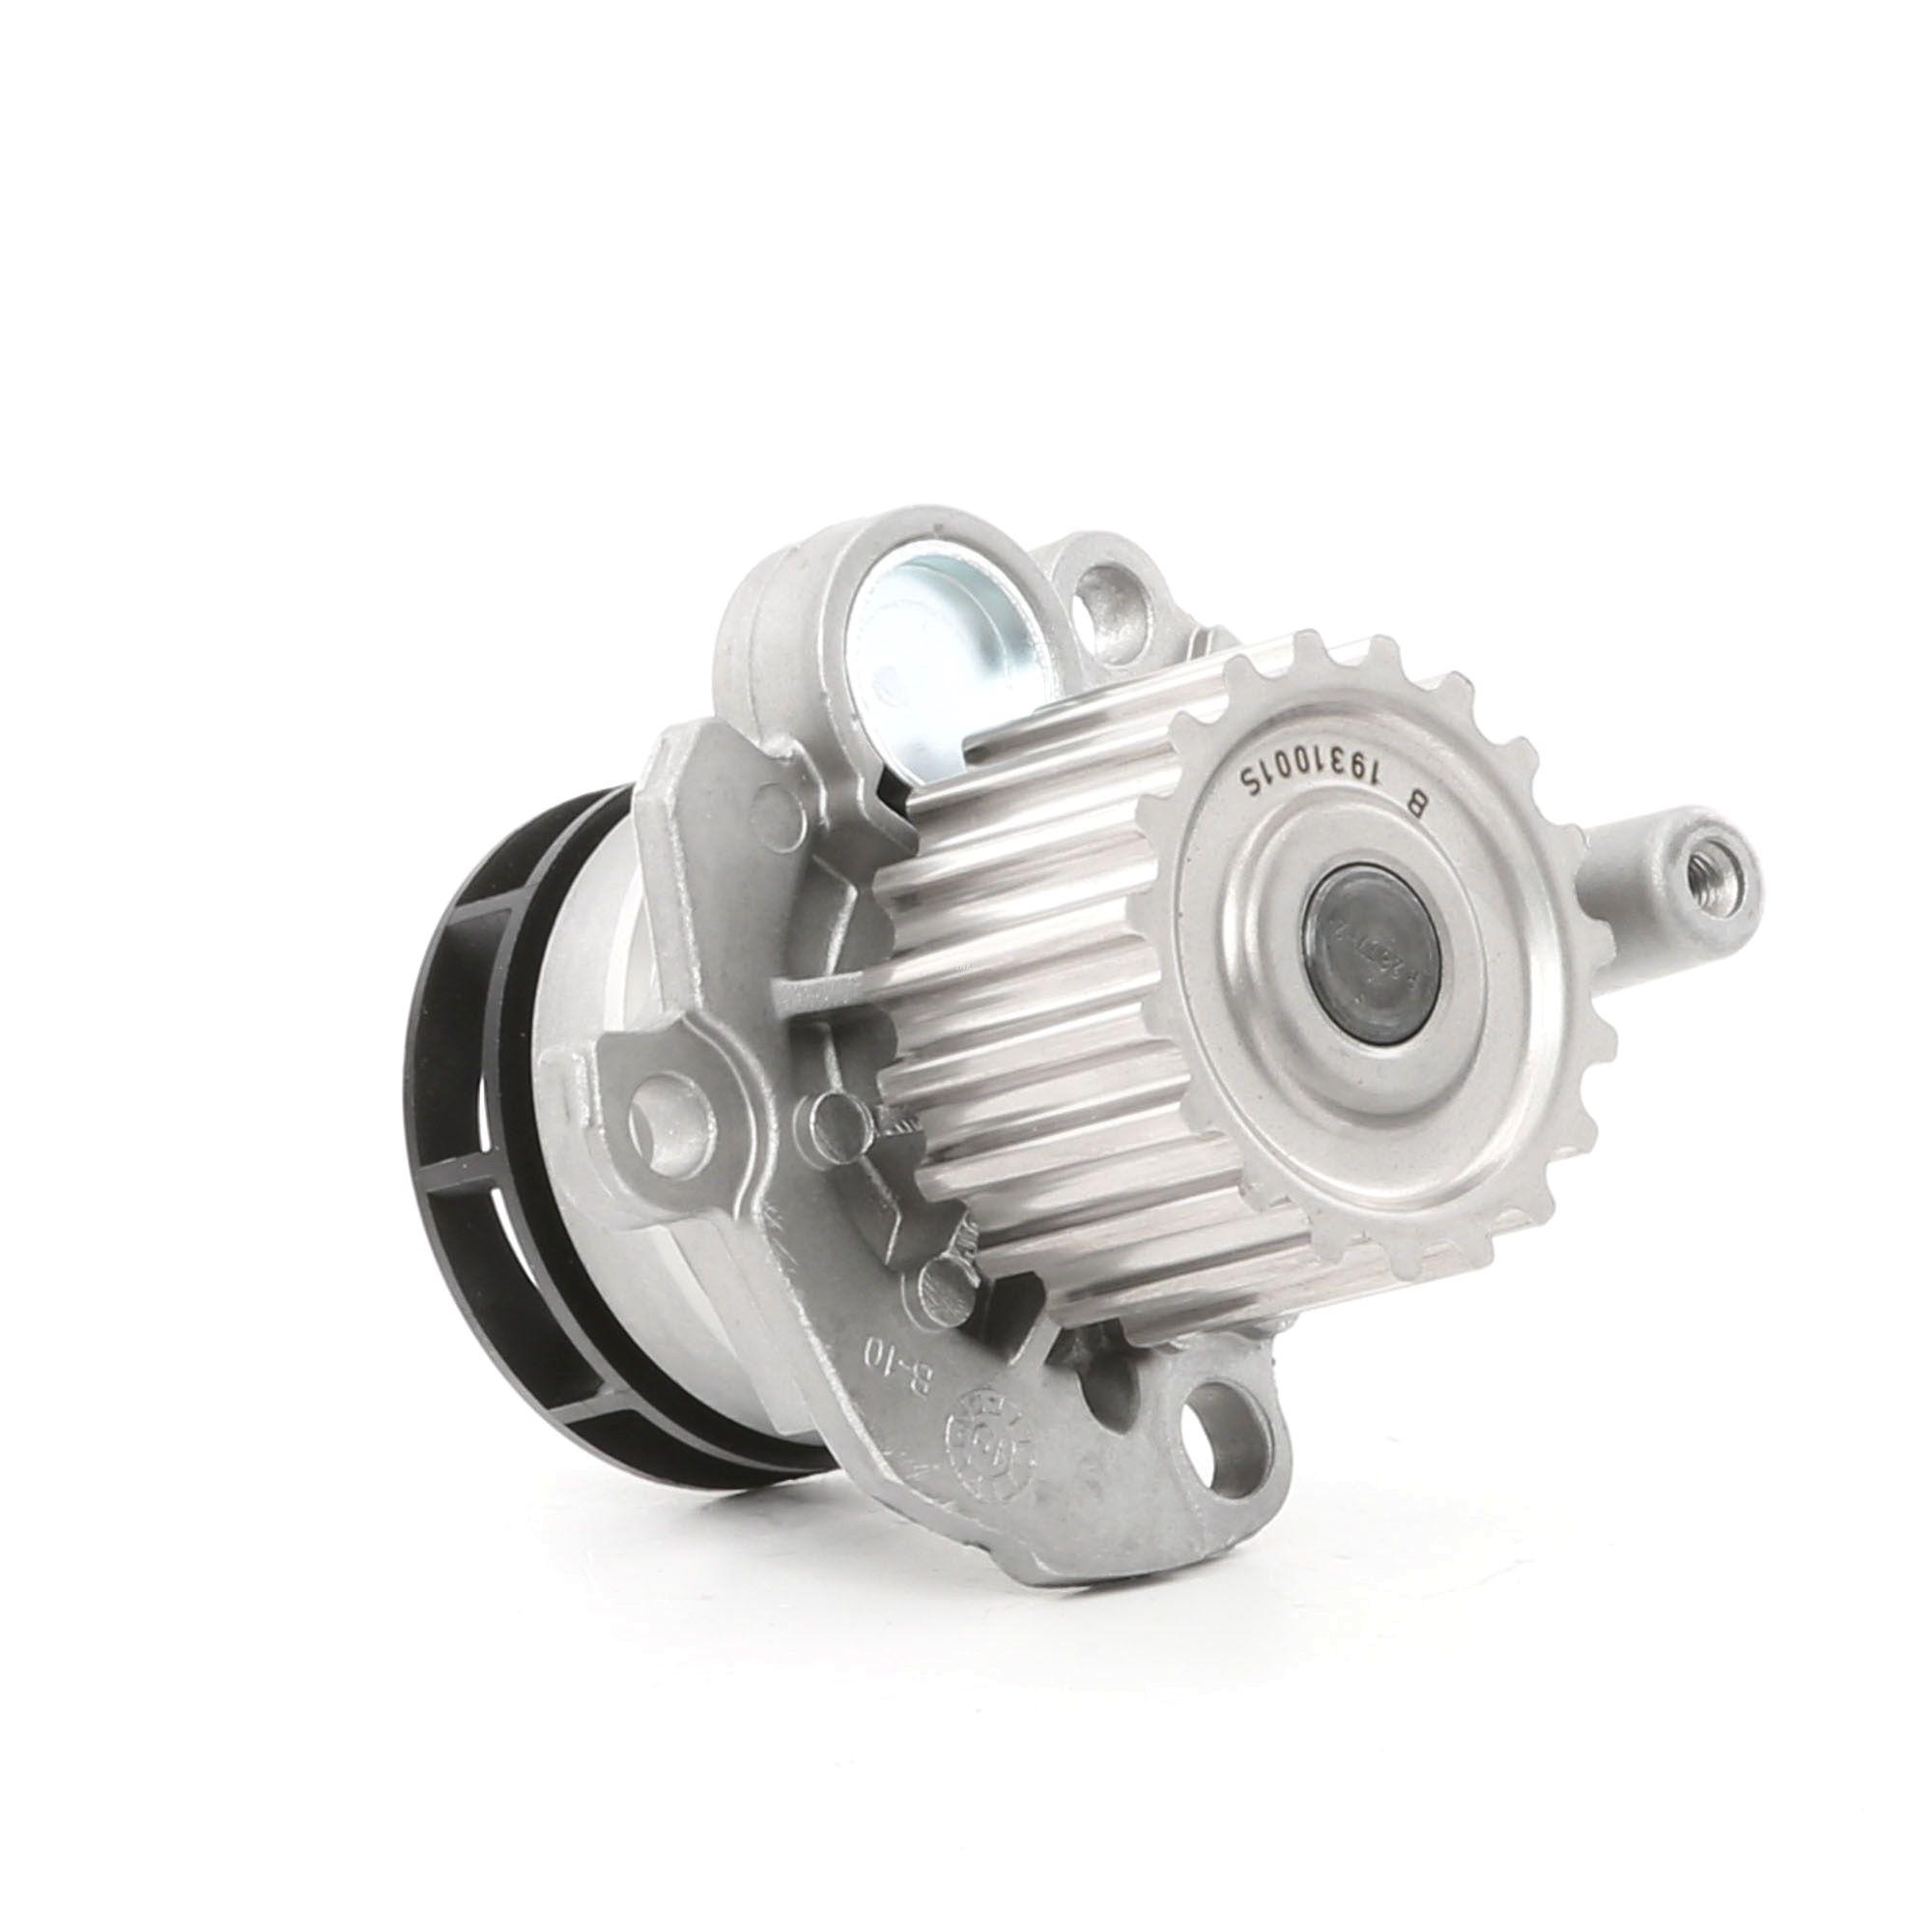 VW GOLF 2015 Kühlmittelpumpe - Original INA 538 0089 10